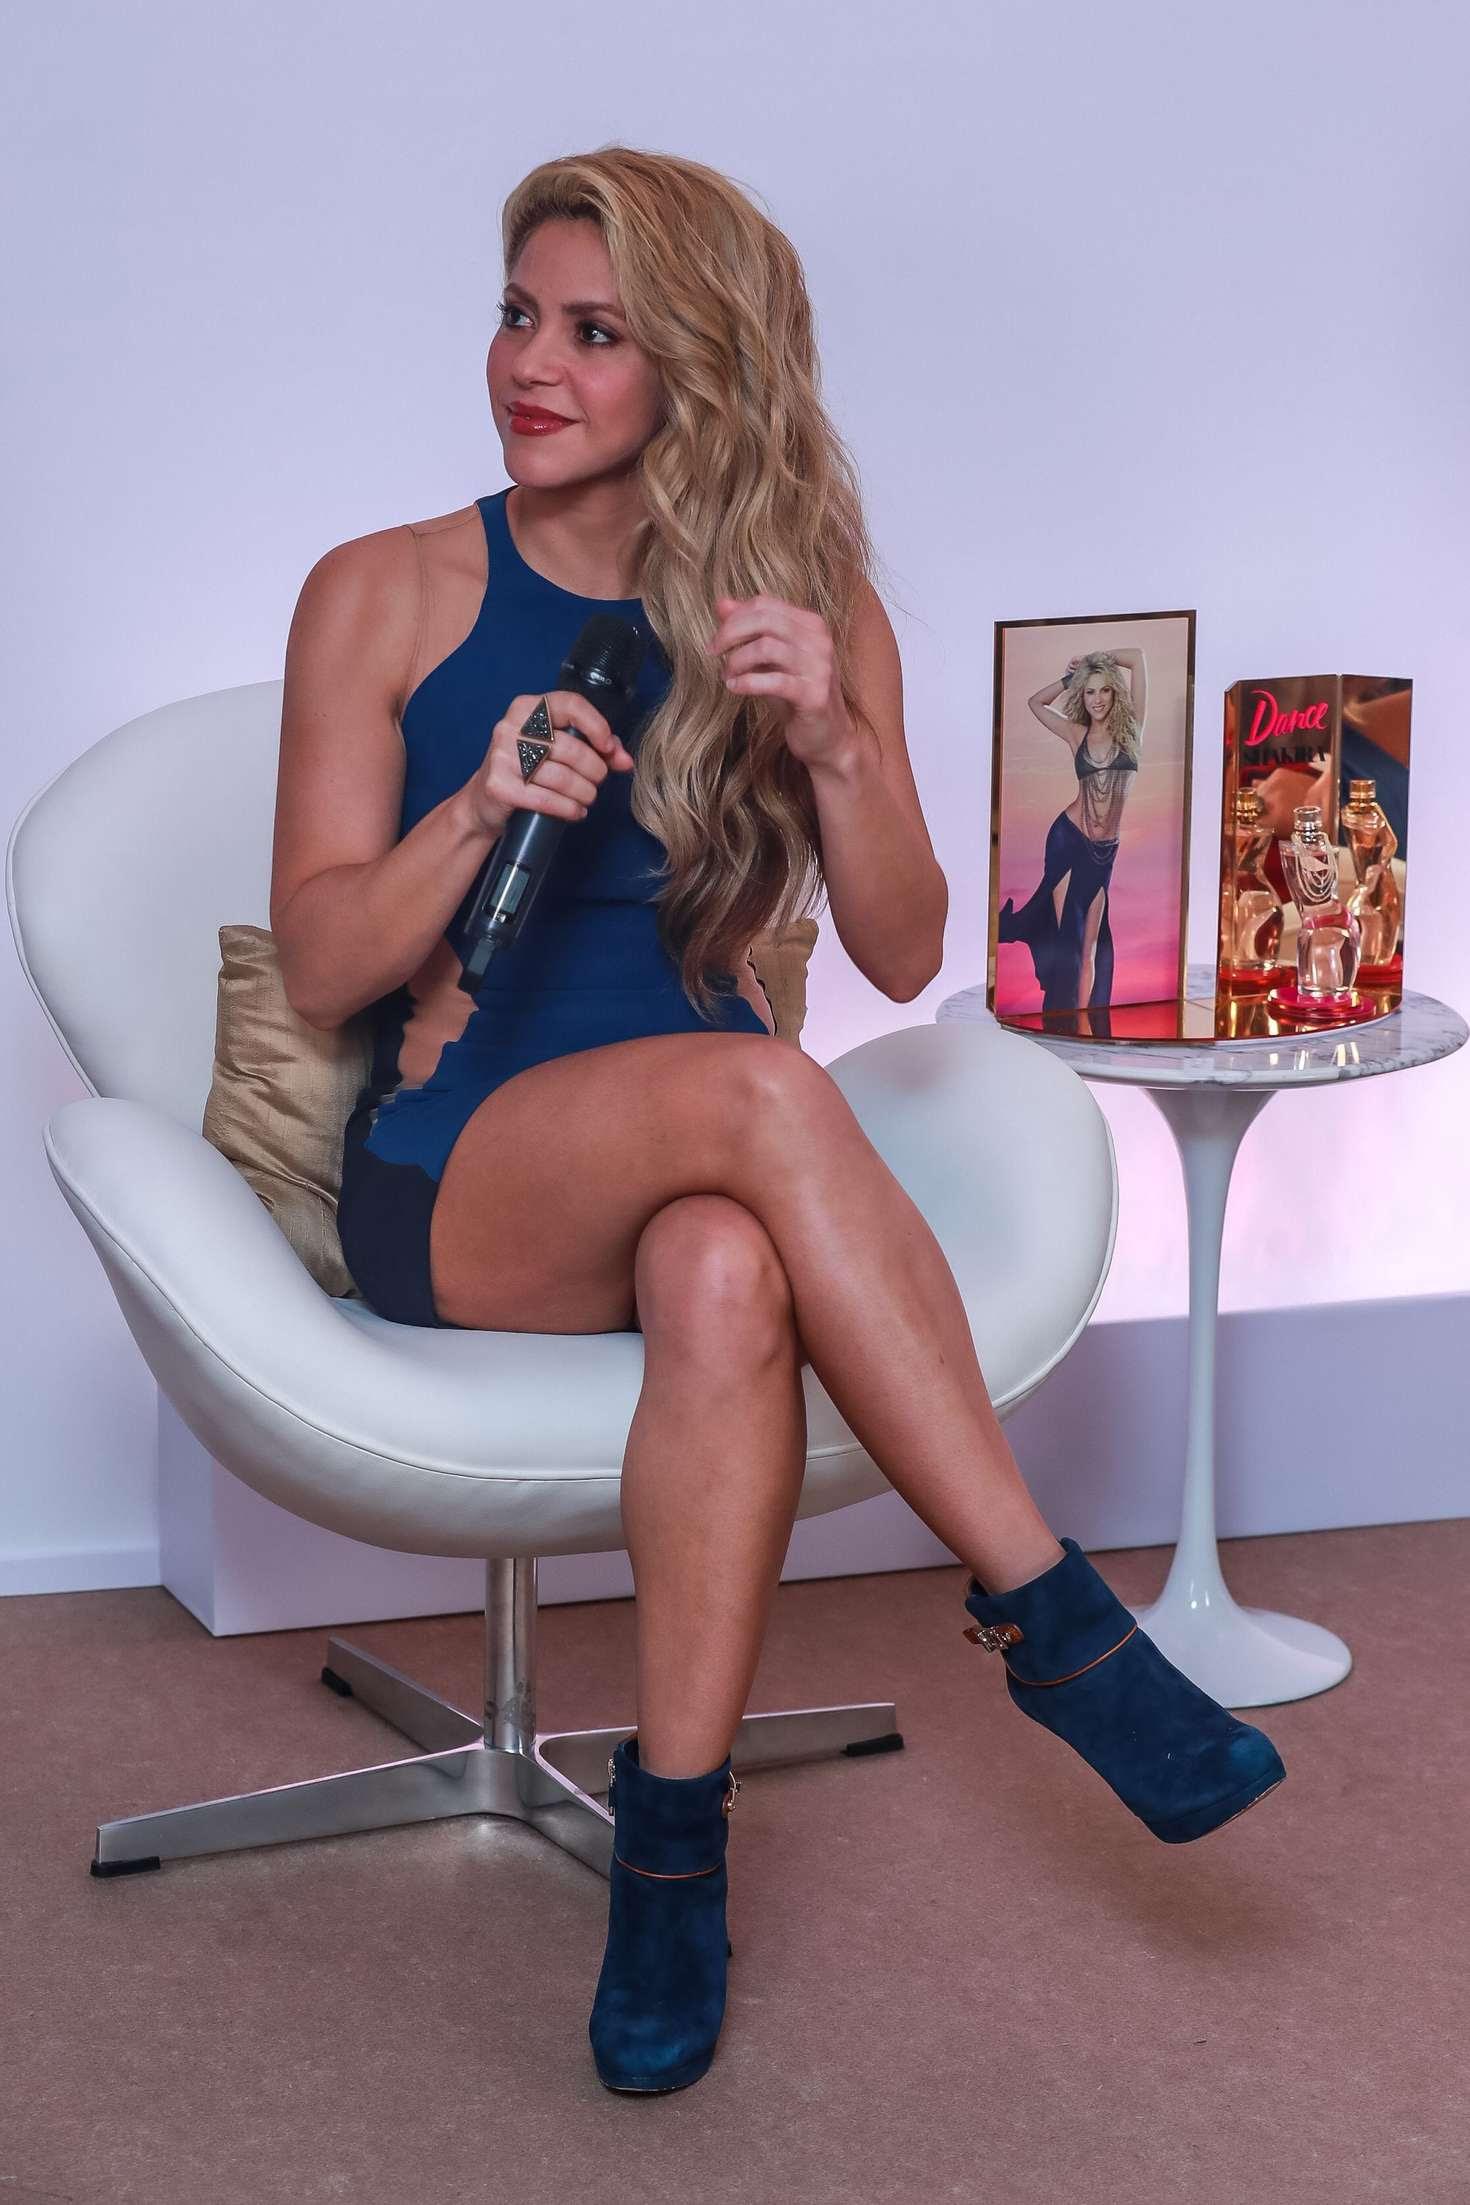 Shakira At Her New Fragrance Line Dance In Sao Paulo  Indian Girls Villa -7166